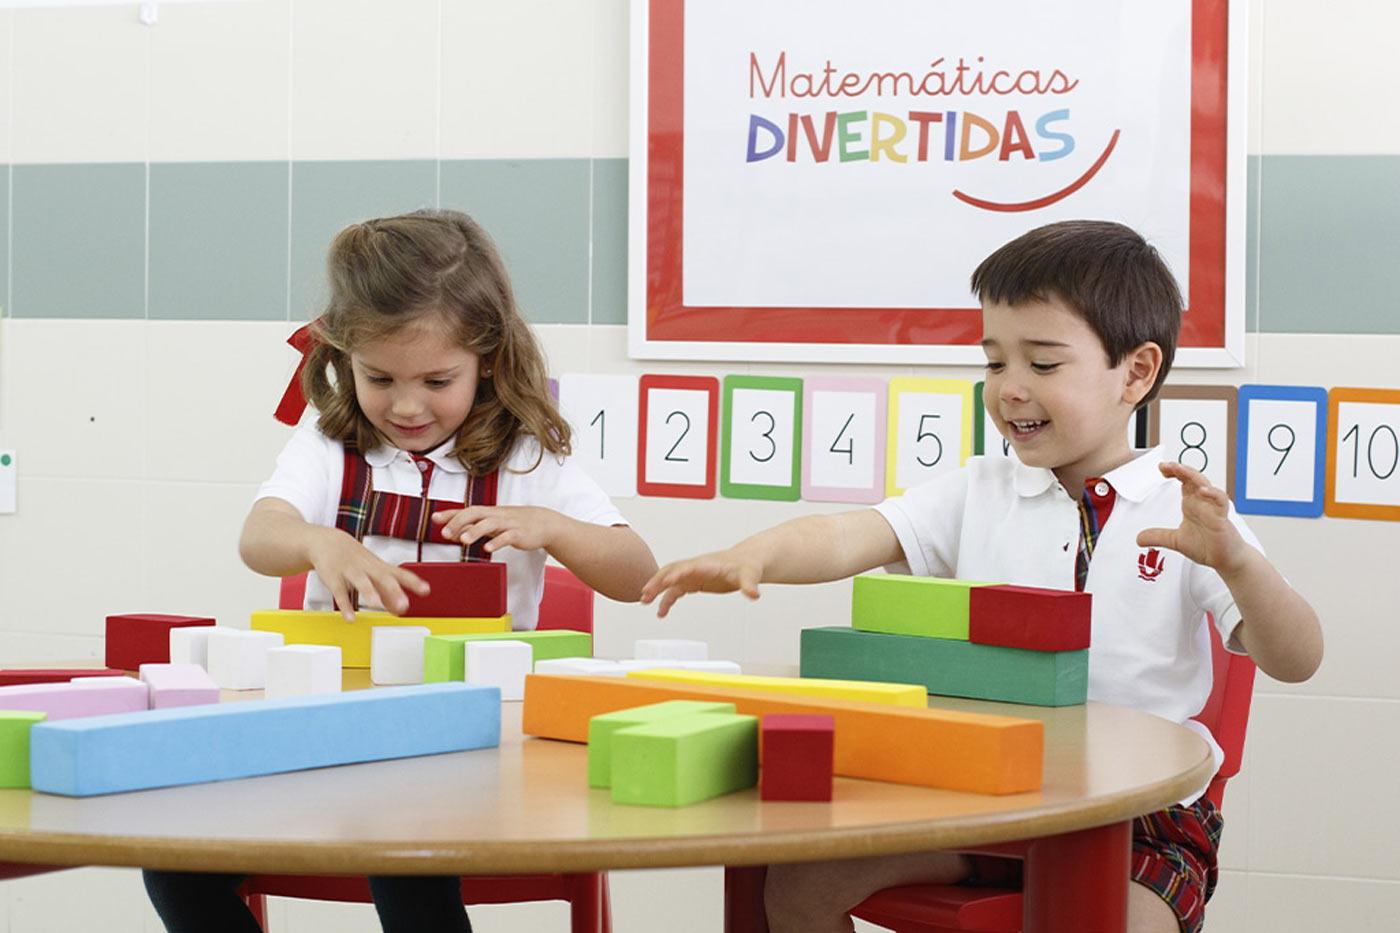 MATEMATICAS-DIVERTIDAS-EI-4_TABLET-2